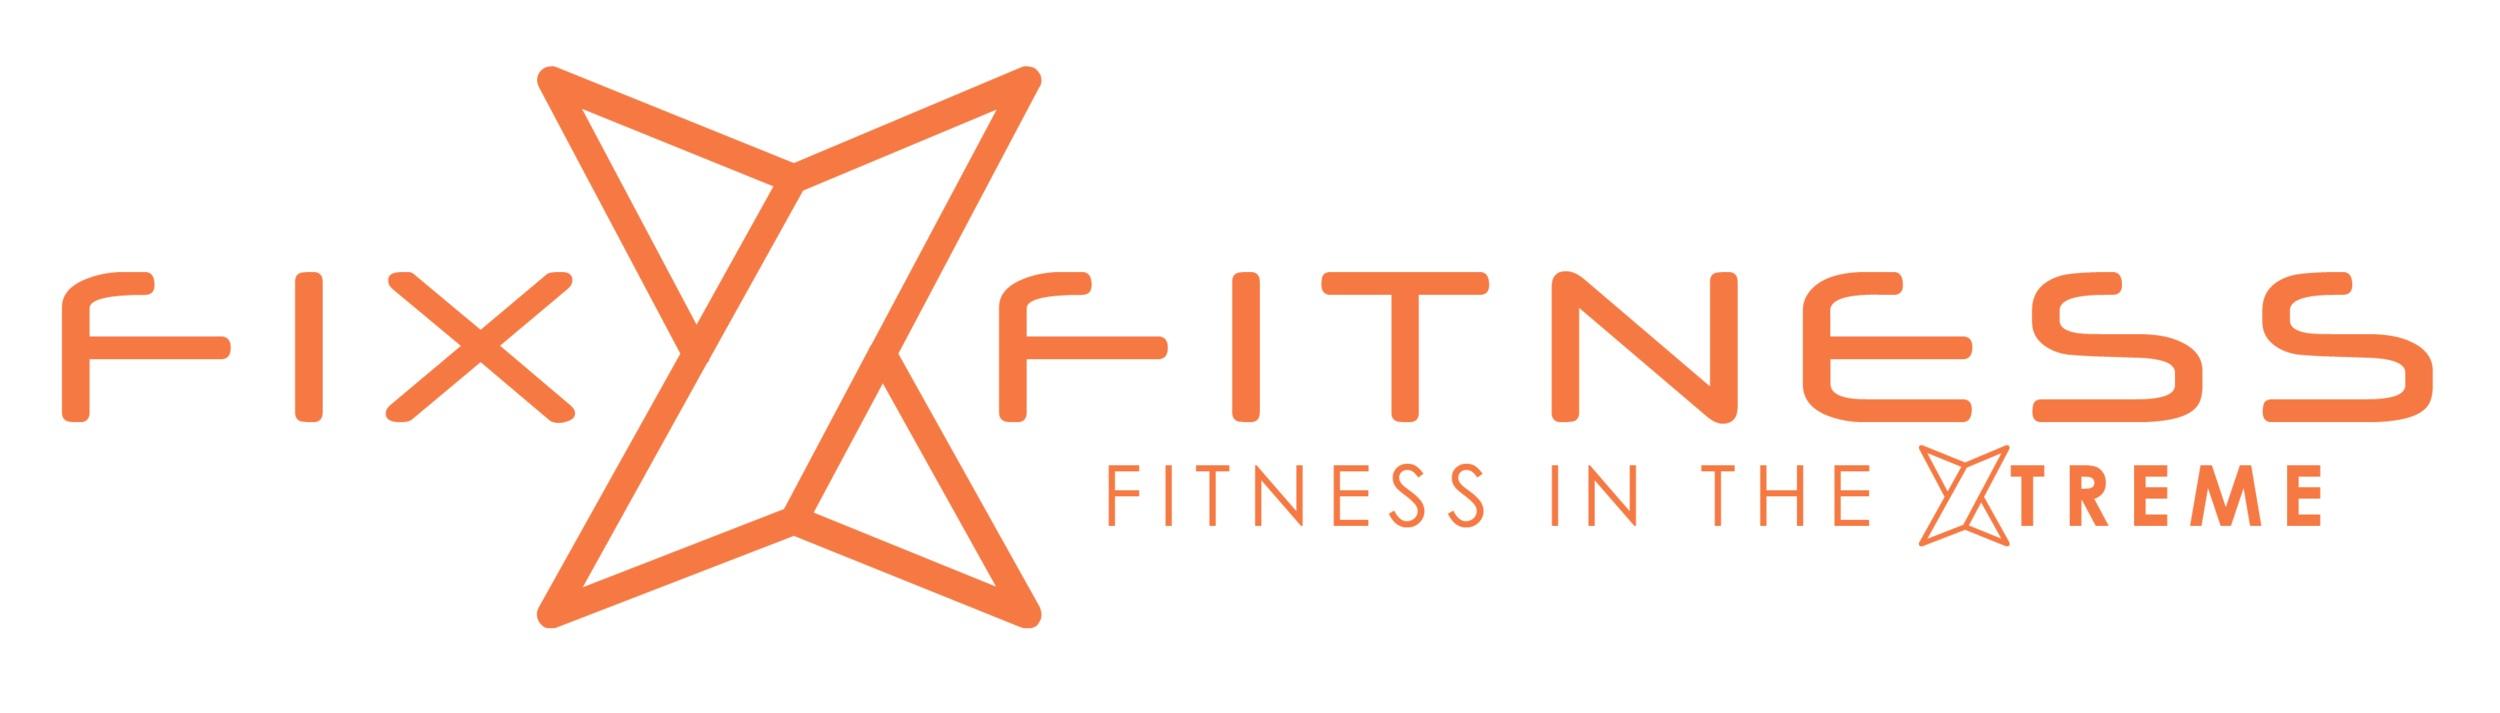 FF_logo_orange.jpg